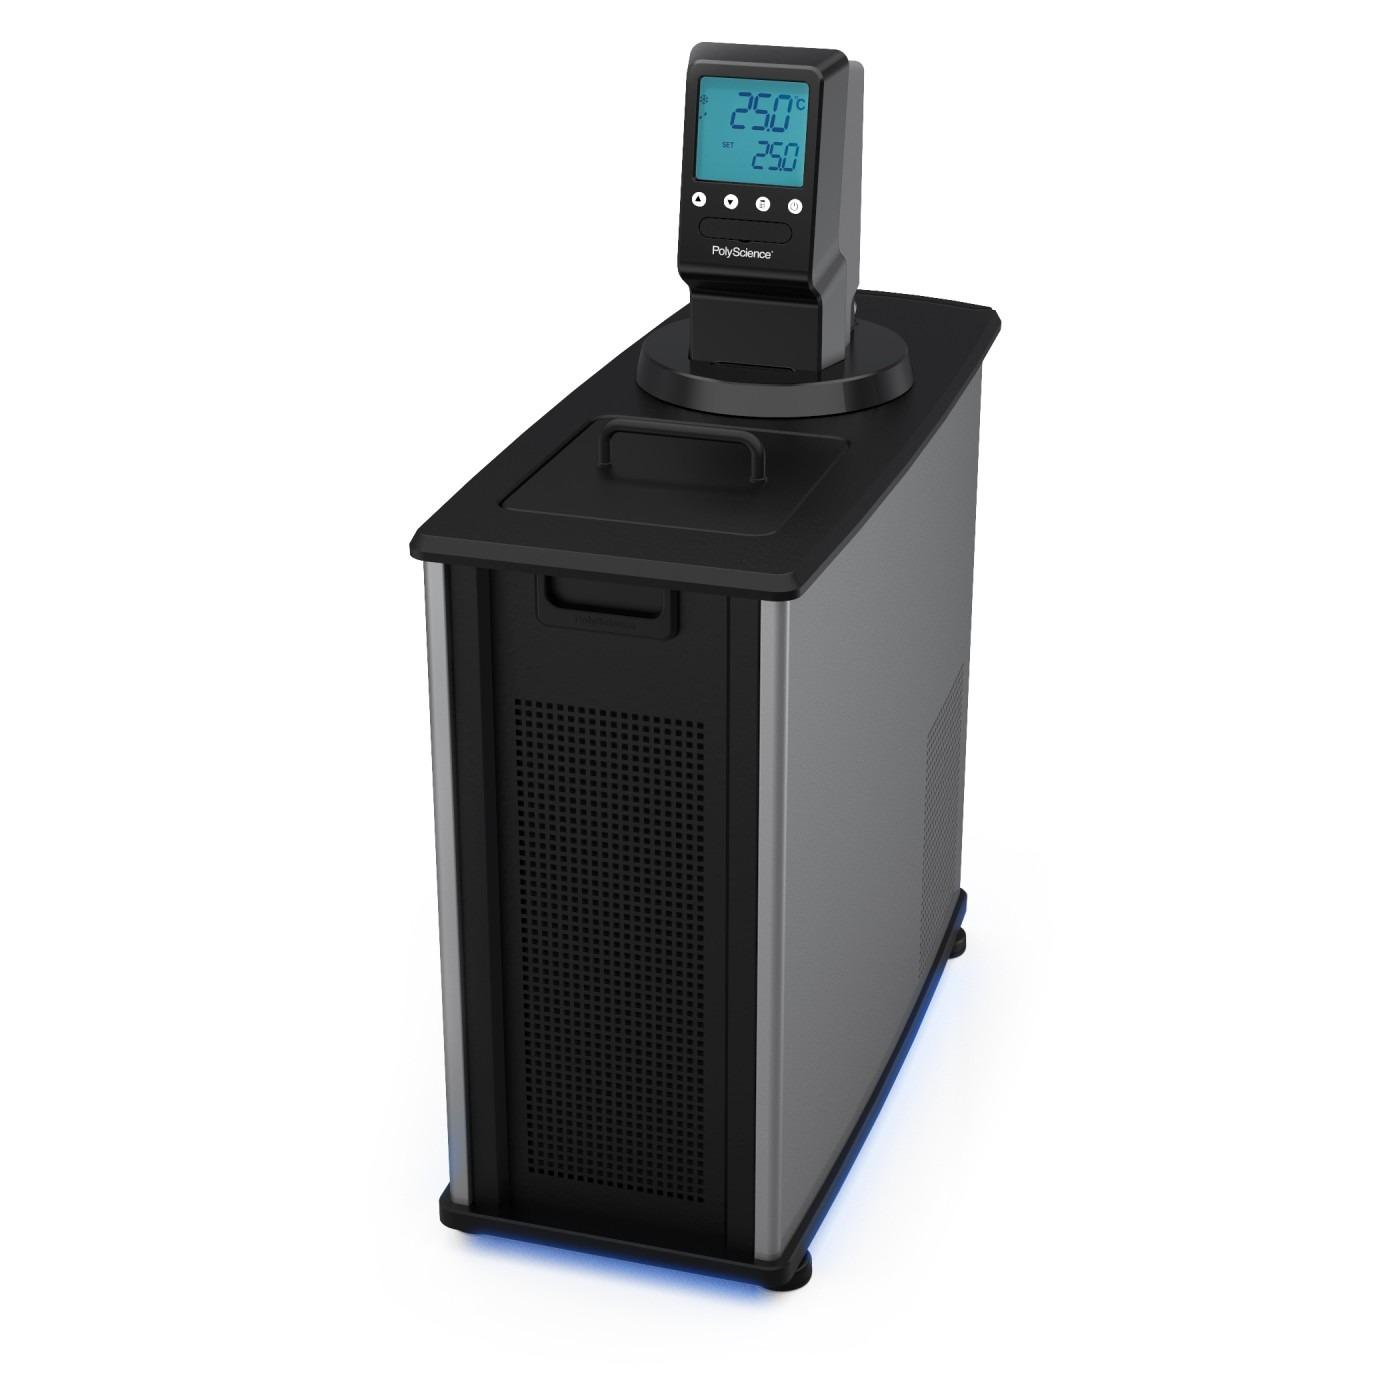 Polyscience 7 Liter MX Refrigerated Circulator